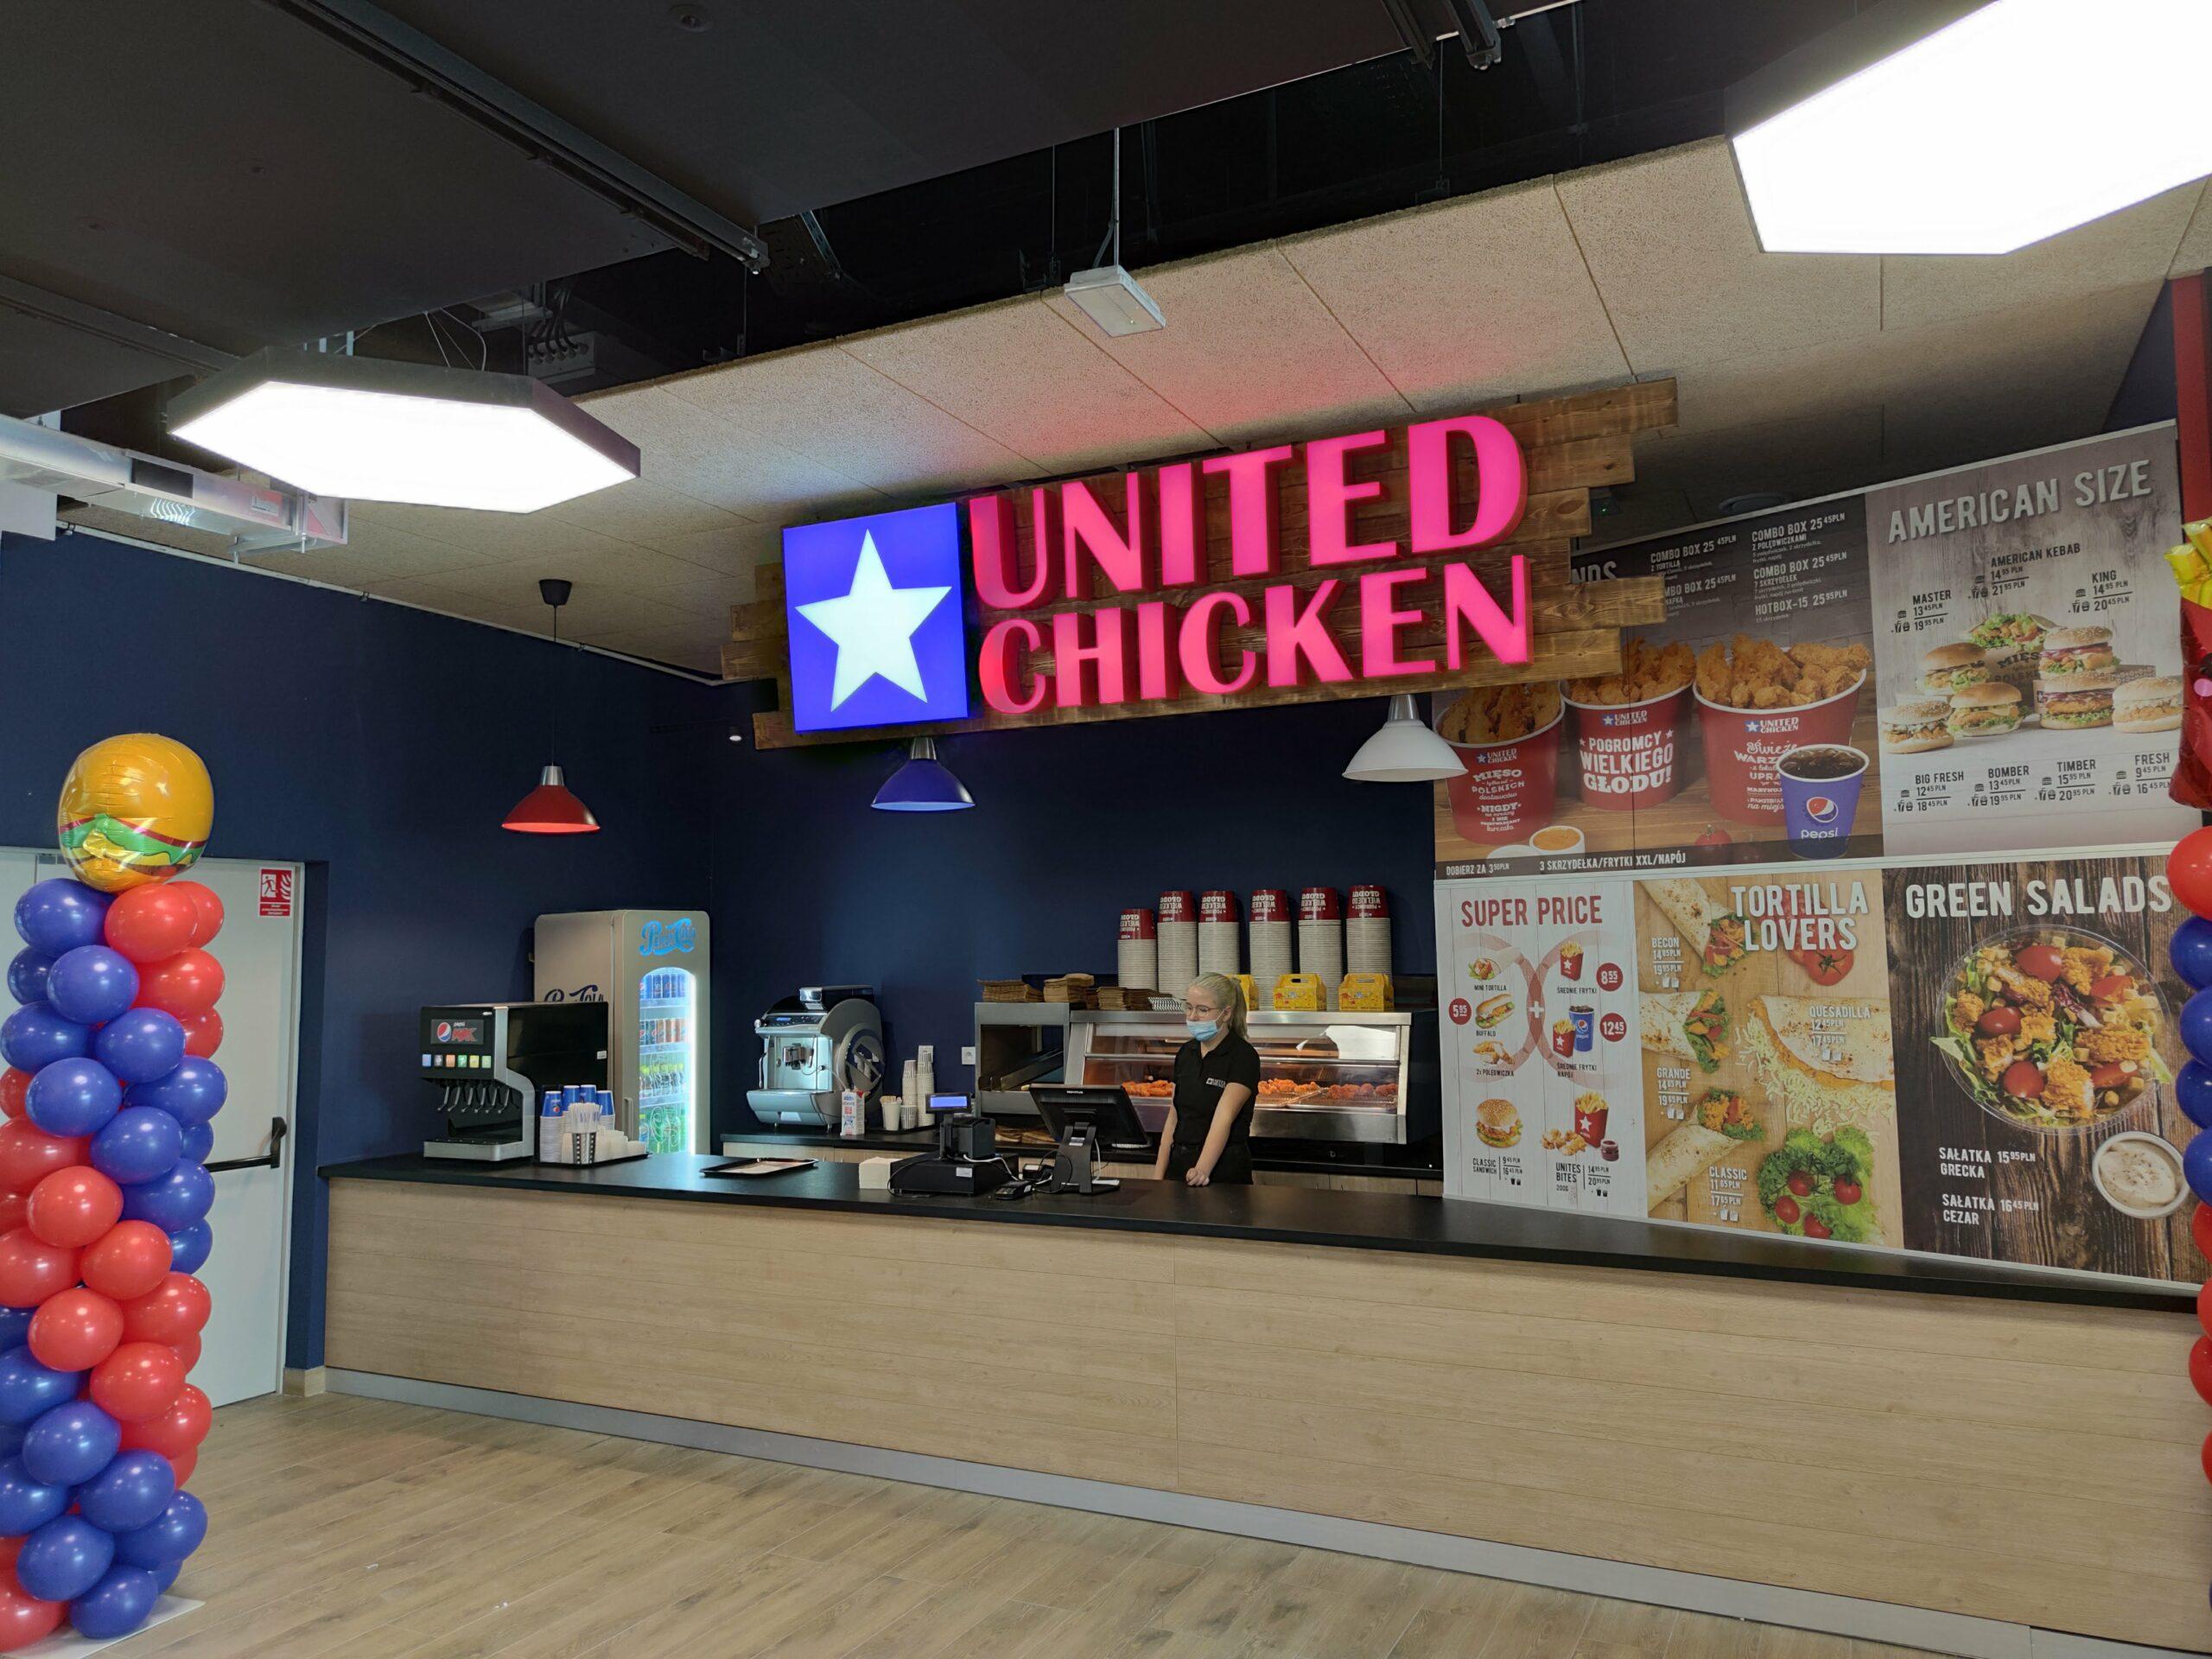 Sklep United Chicken w Galerii Odyseja